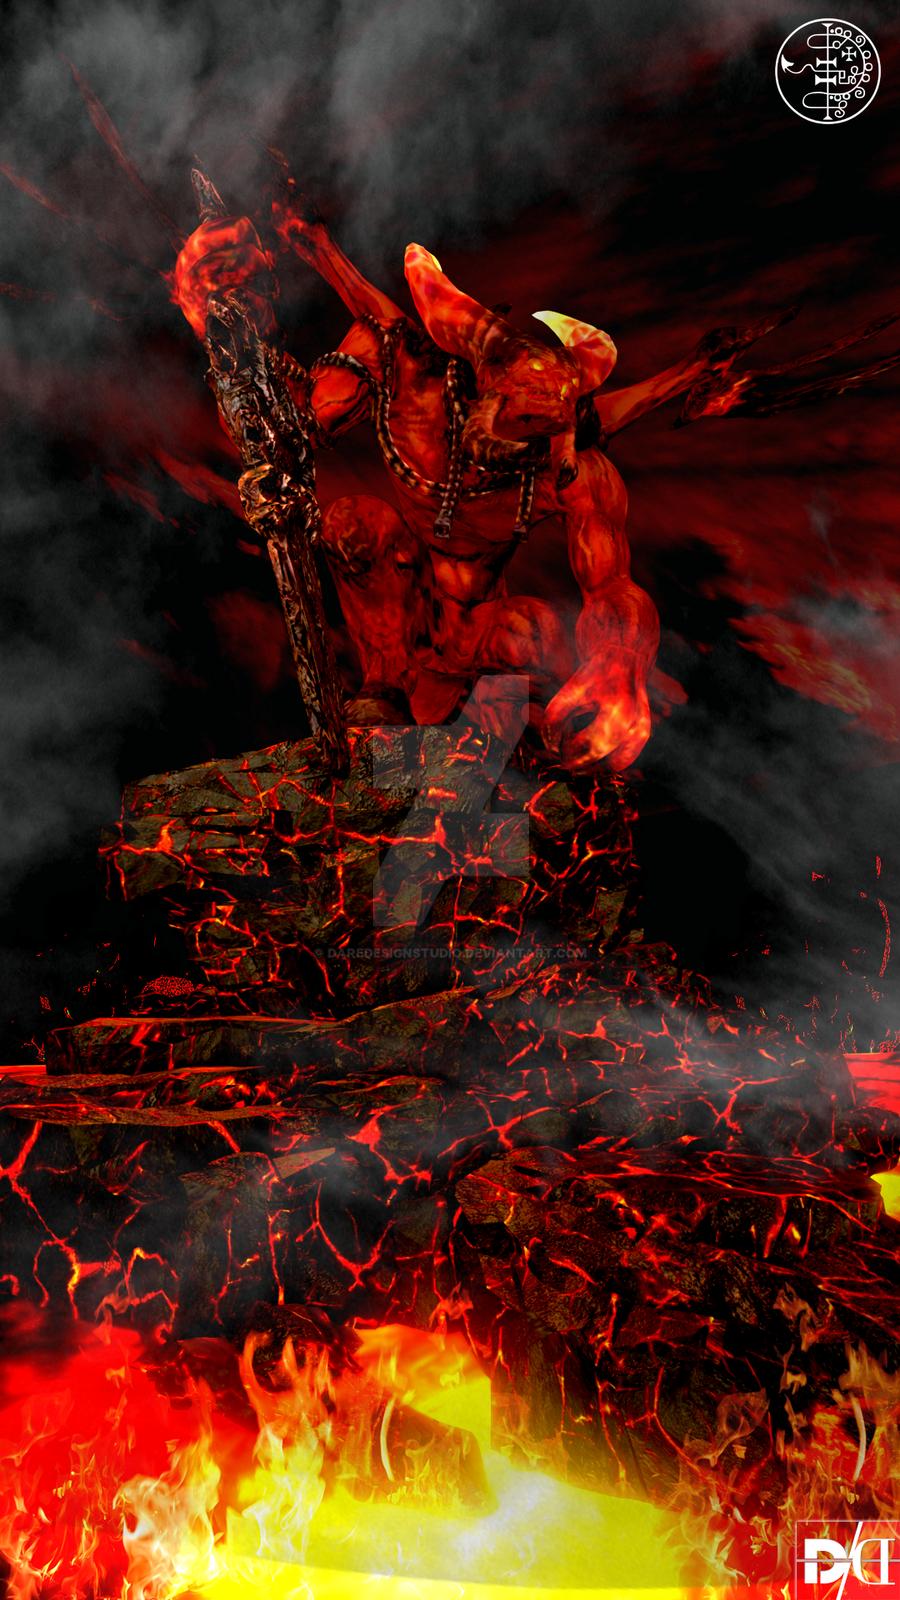 Asmodeus: Demon of Wrath by DareDesignStudio on DeviantArt